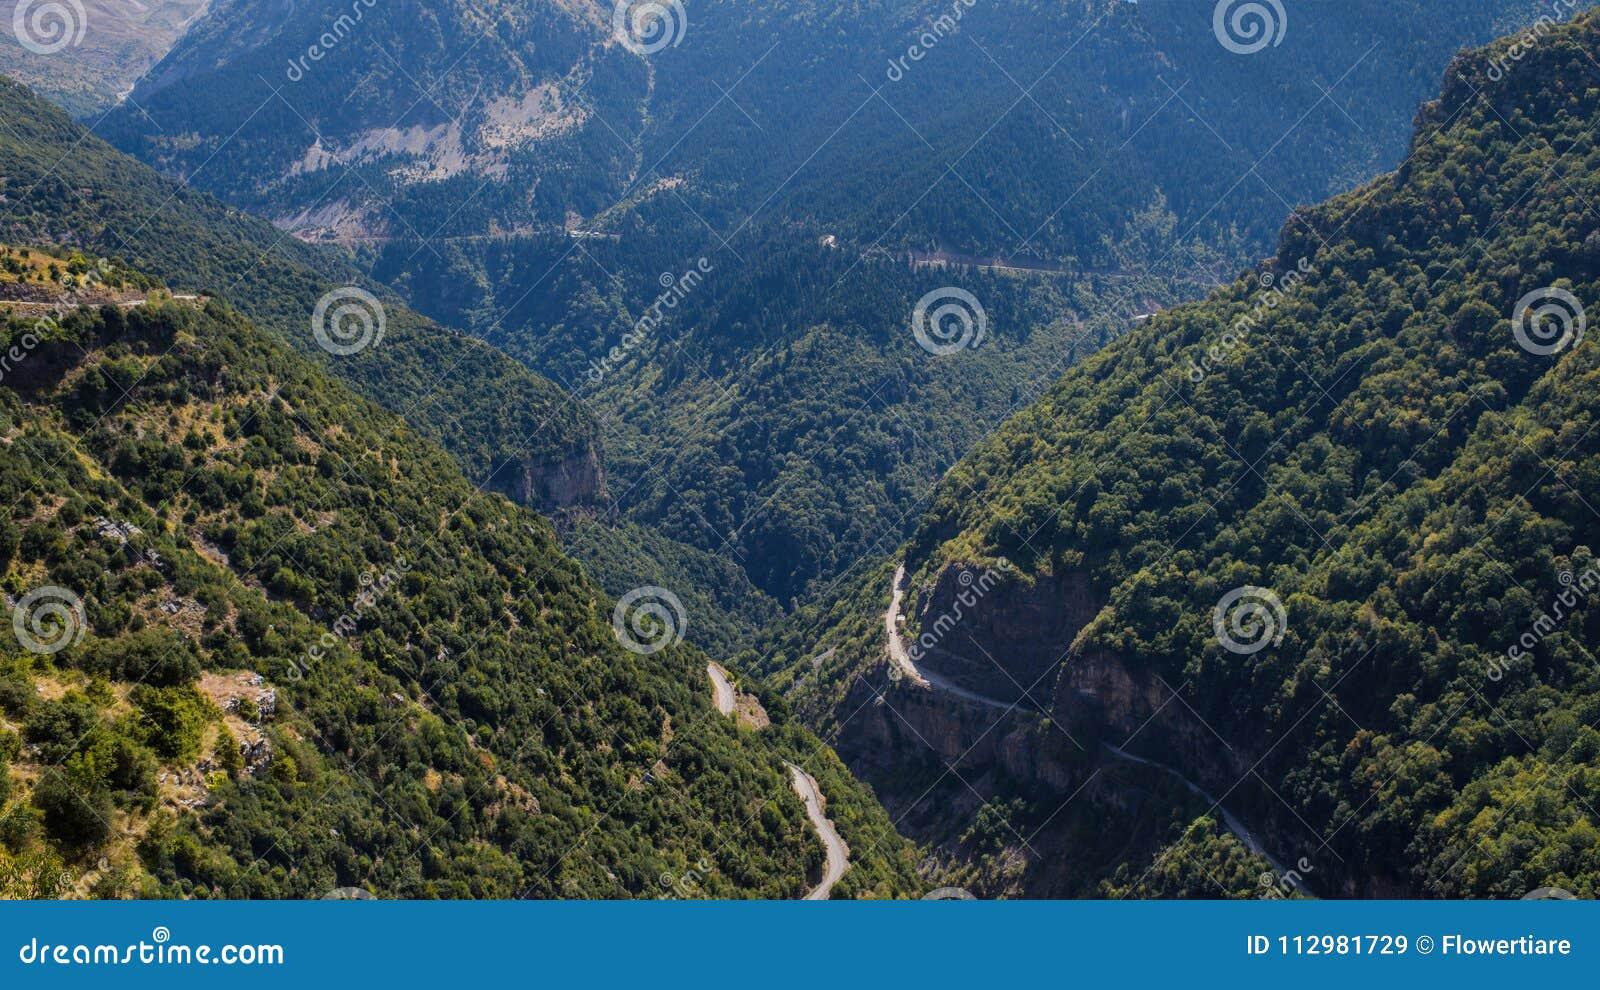 Two rads in mountain in National Park of Tzoumerka, Greece Epirus region. Mountain